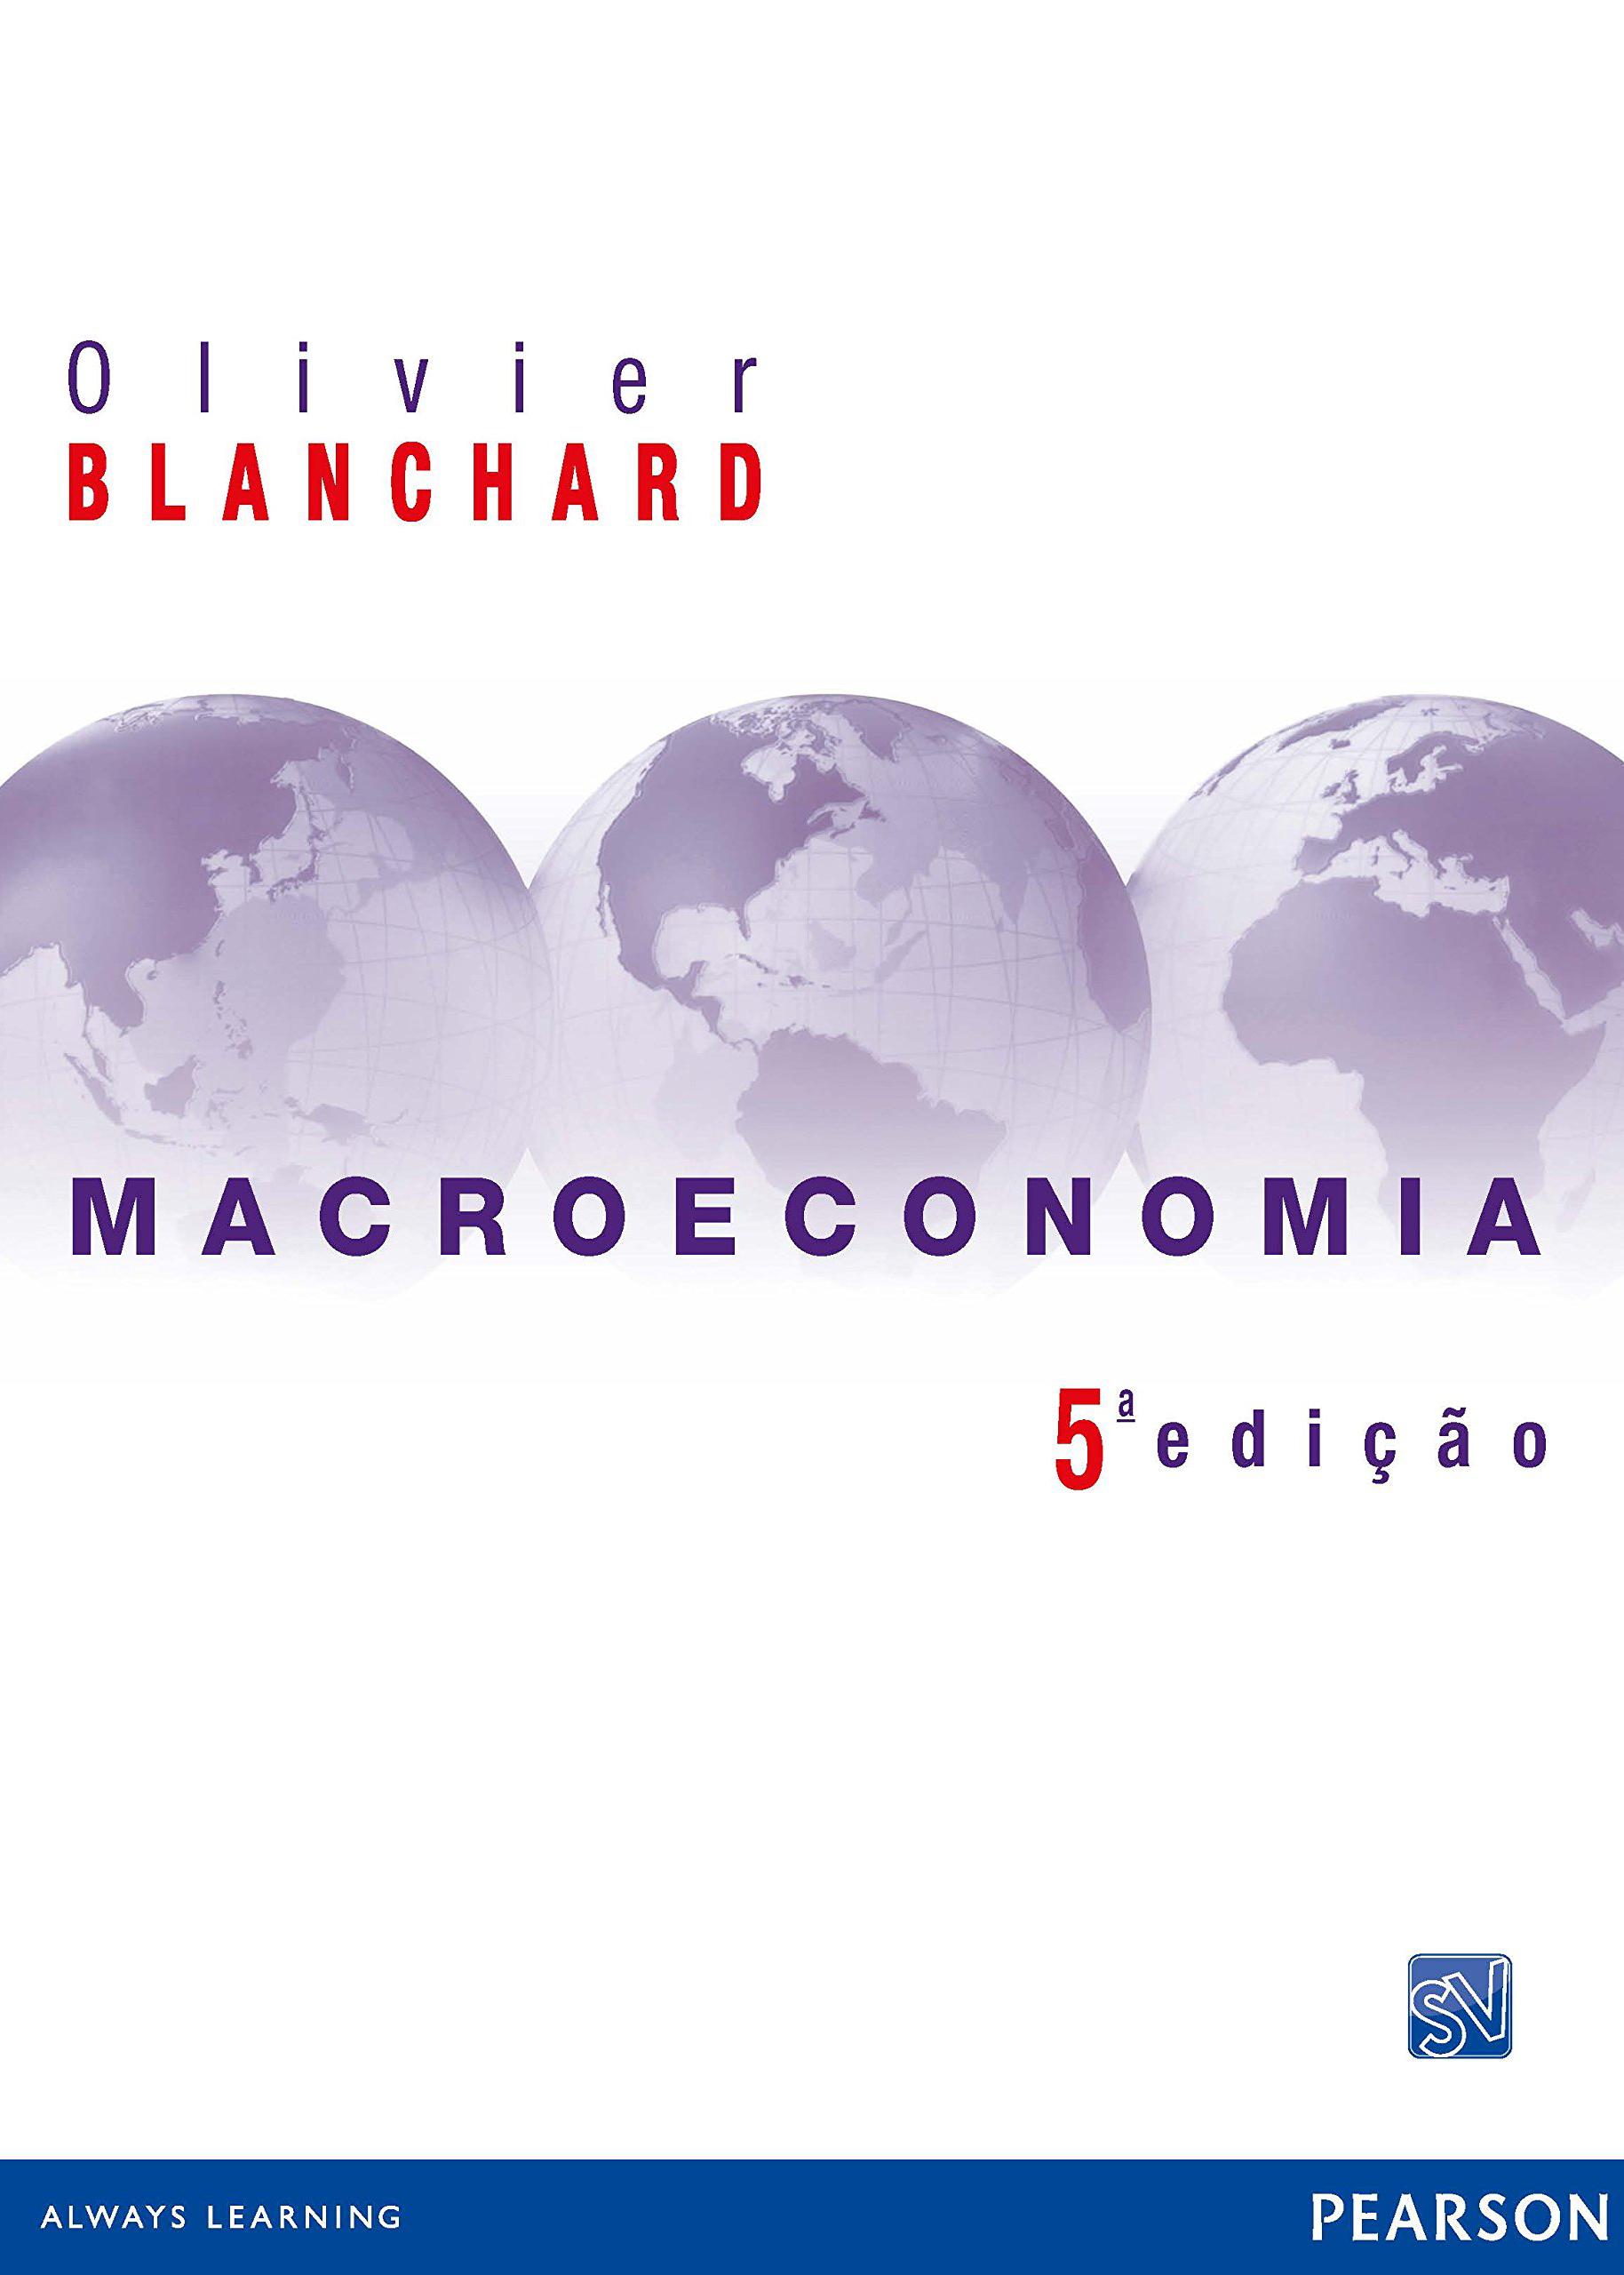 Blanchard, Olivier - Macroeconomia.jpg